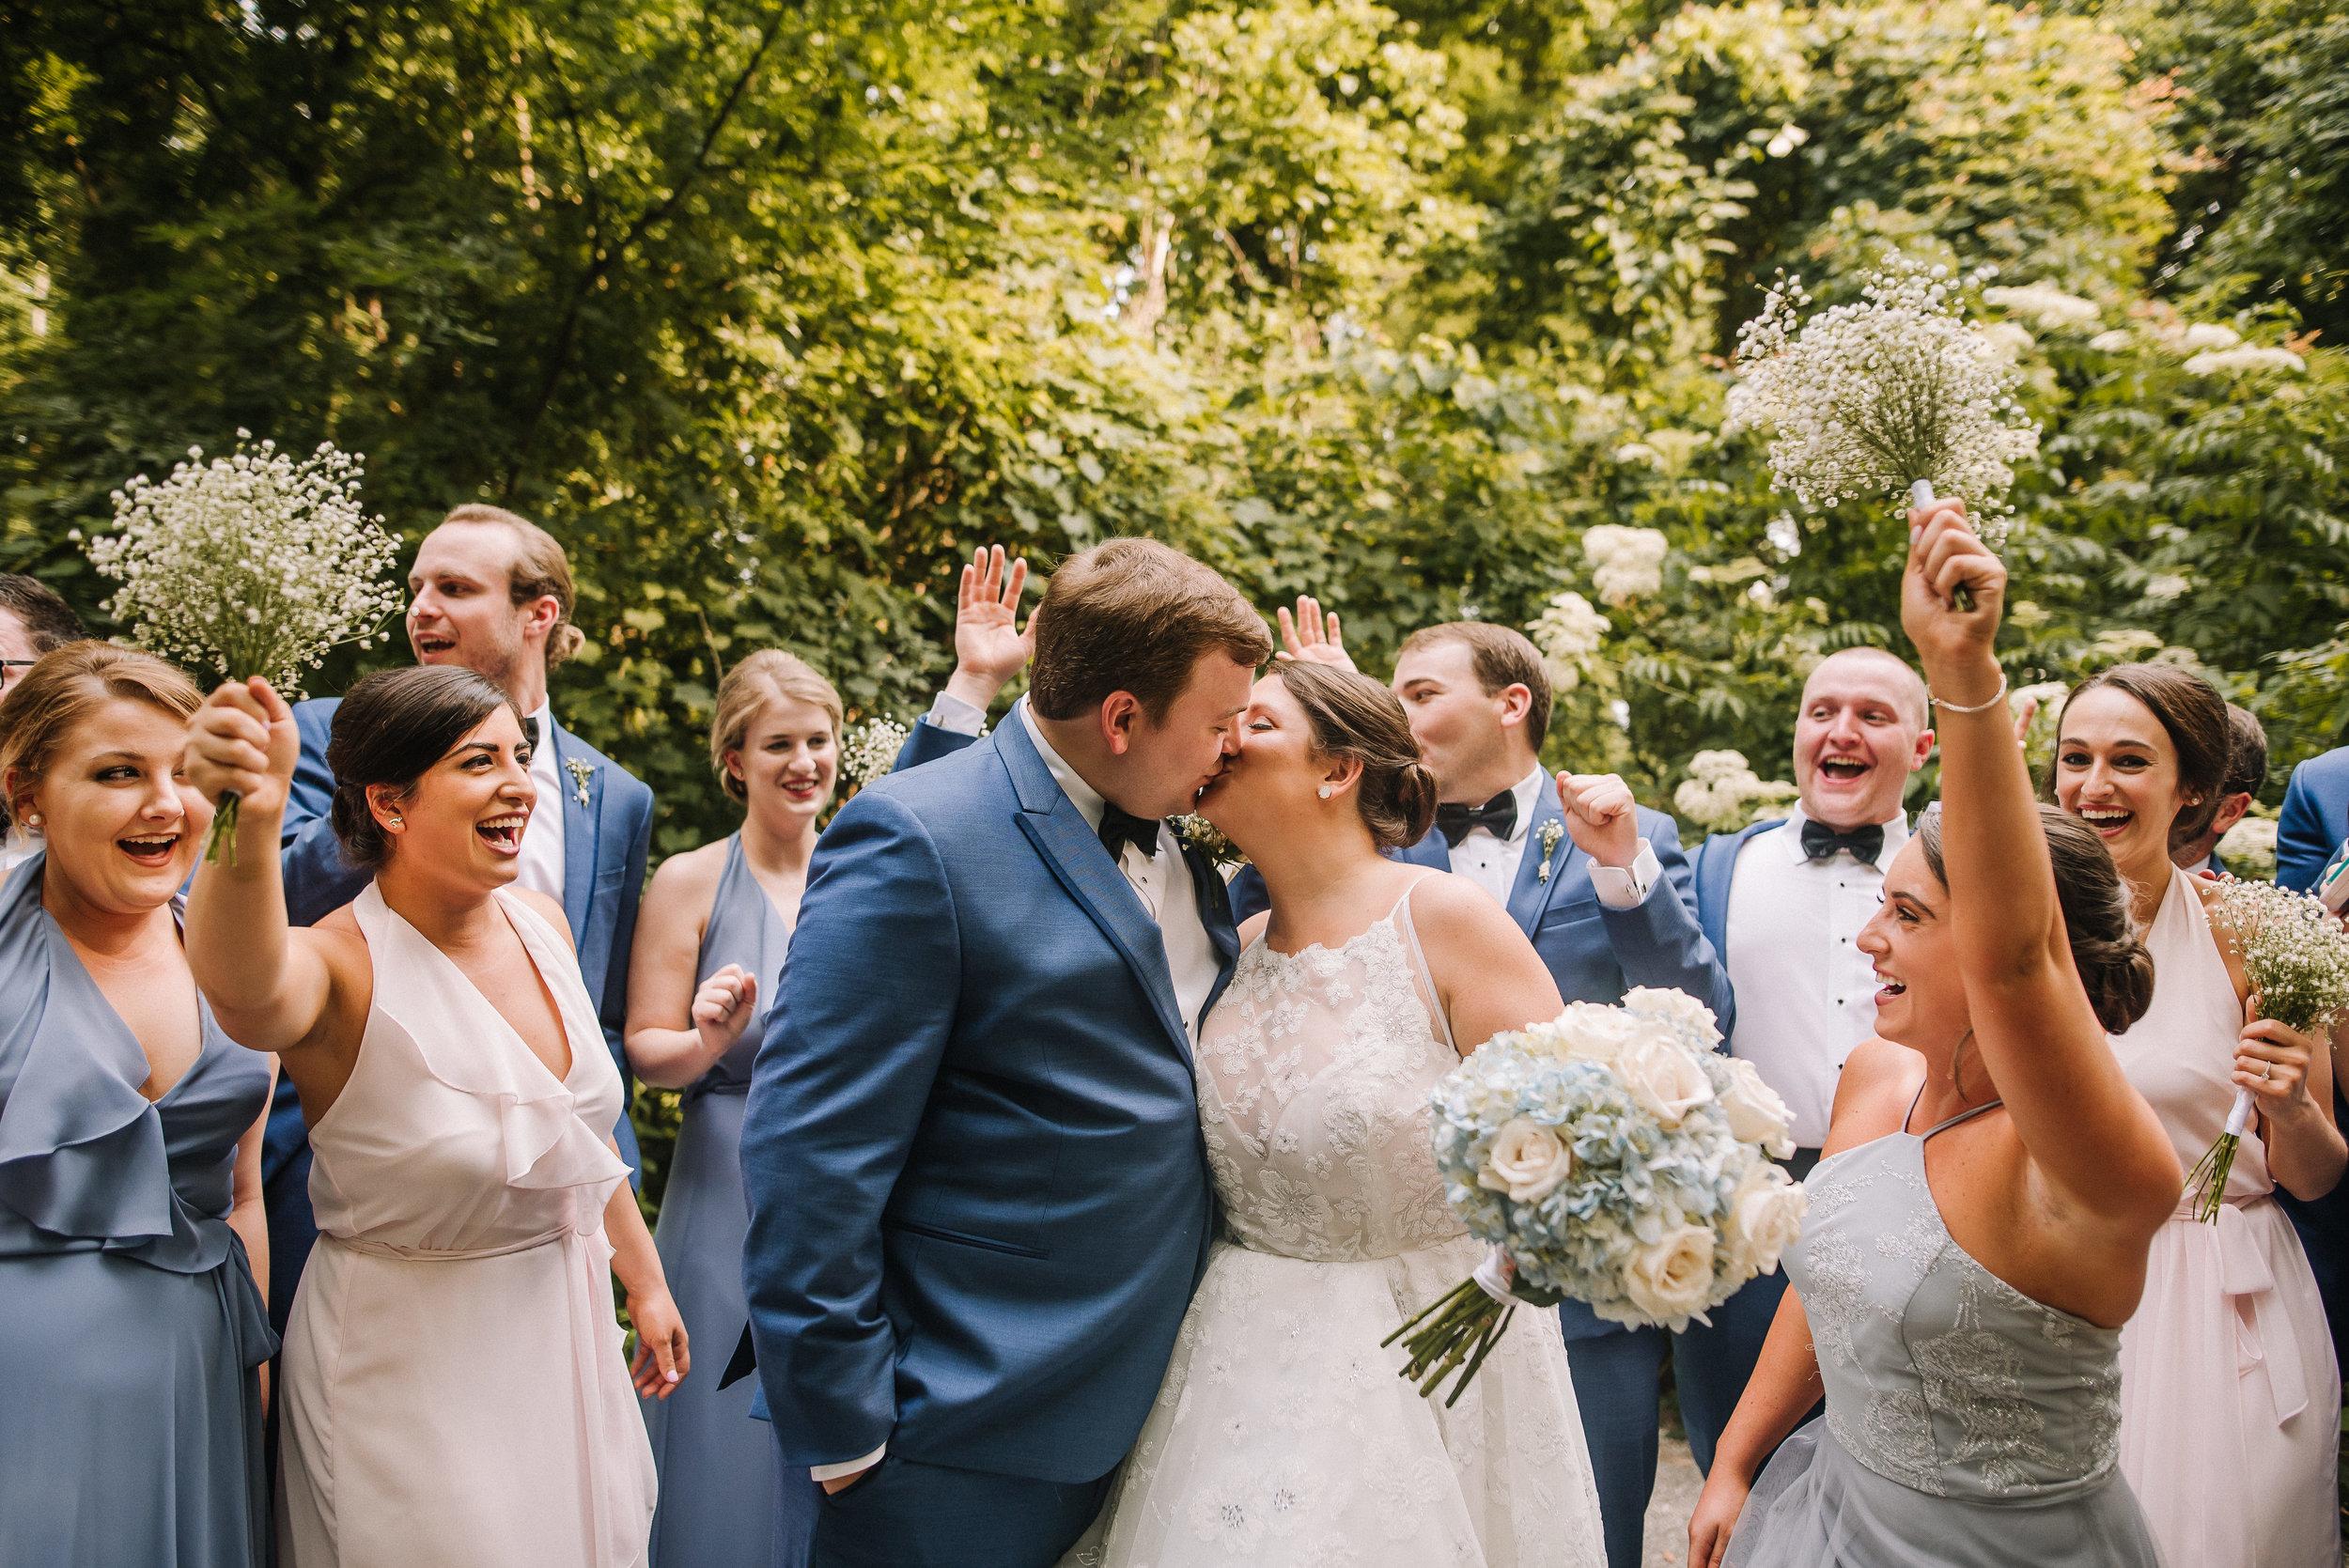 Smith Wedding_Memphis Zoo_Ashley Benham Photography-340.jpg